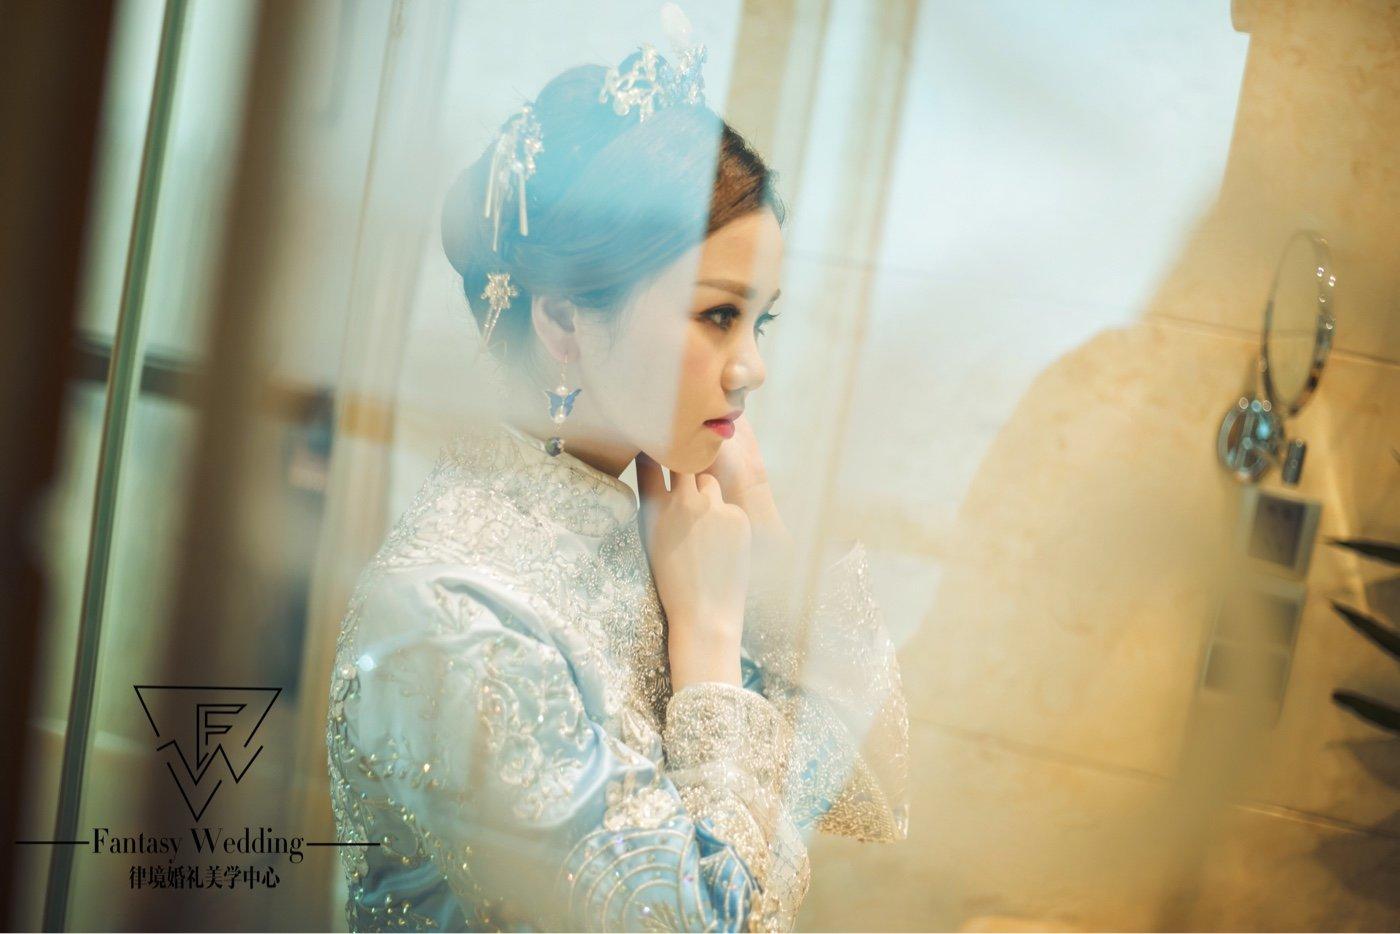 「Fantasy Wedding」&汉式婚礼6